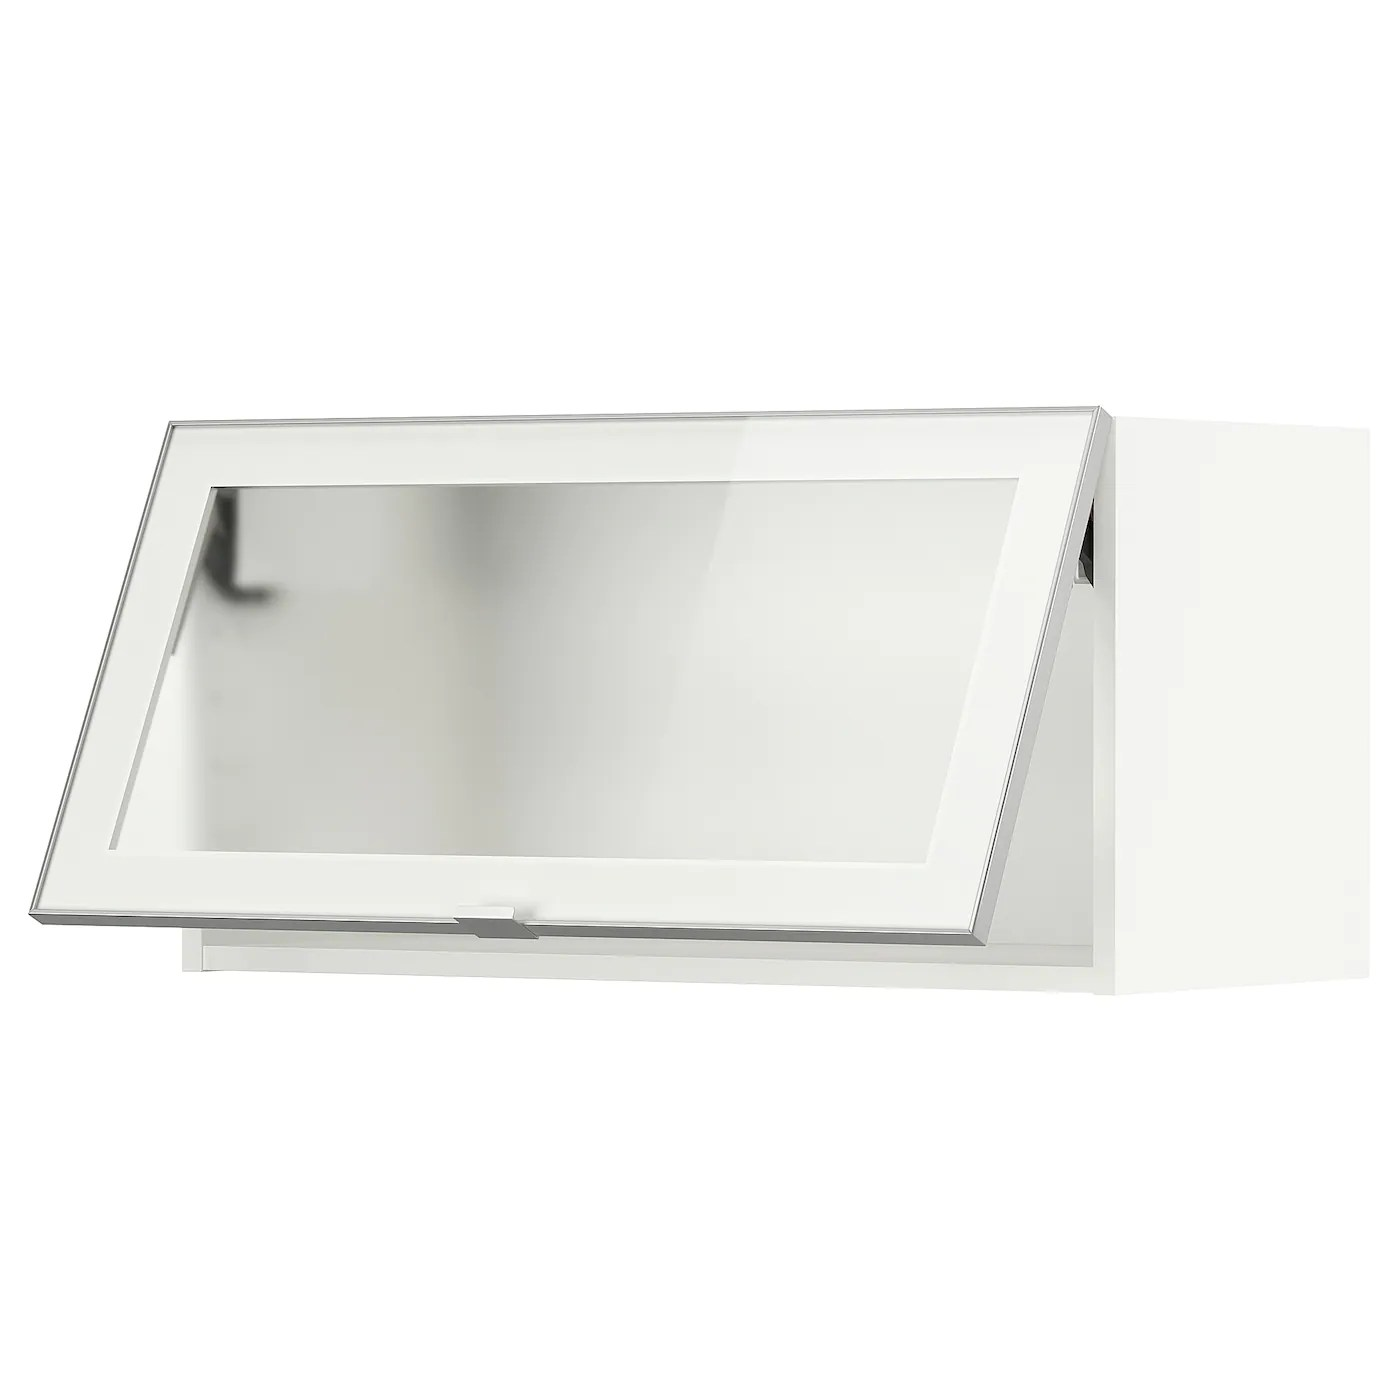 metod element mural horizontal vitre blanc jutis verre givre 80x40 cm